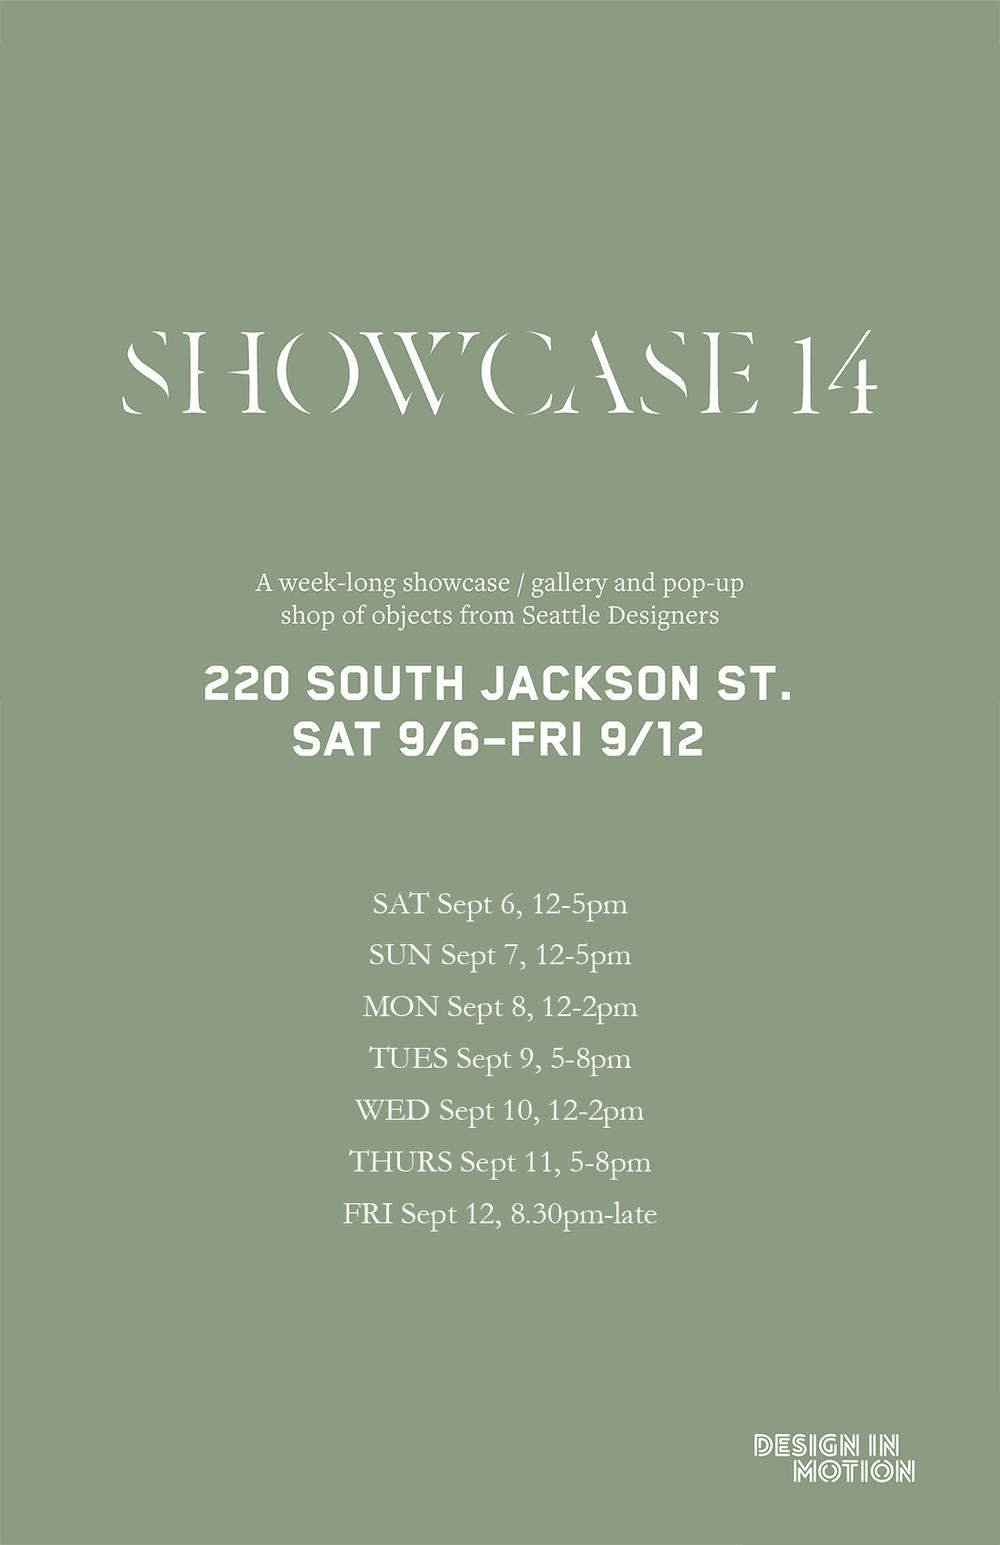 showcase times.jpg